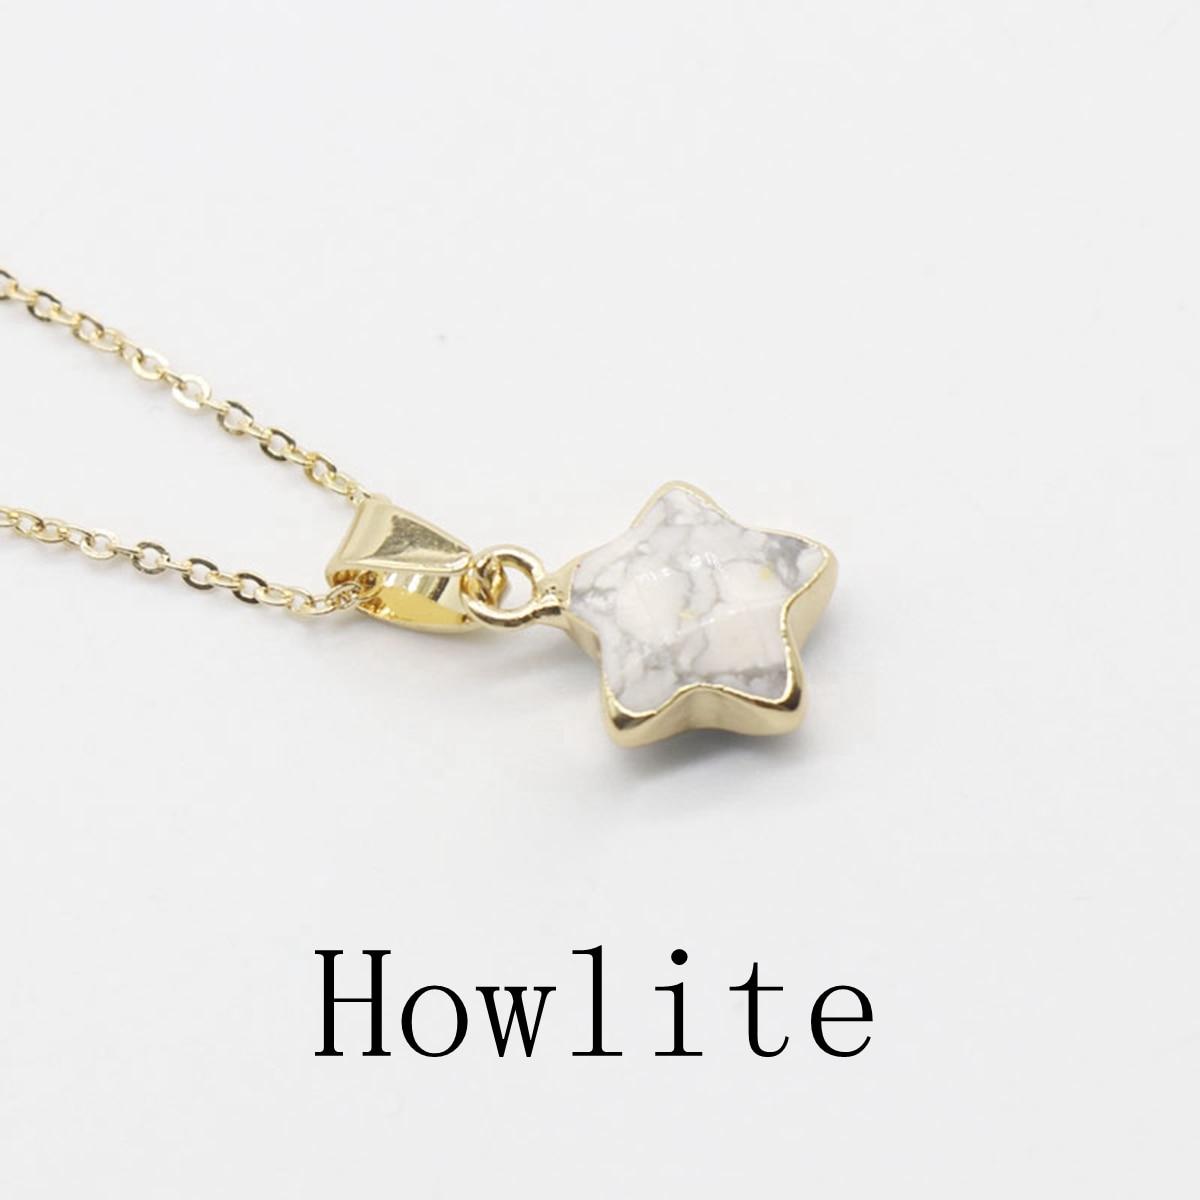 Howlite